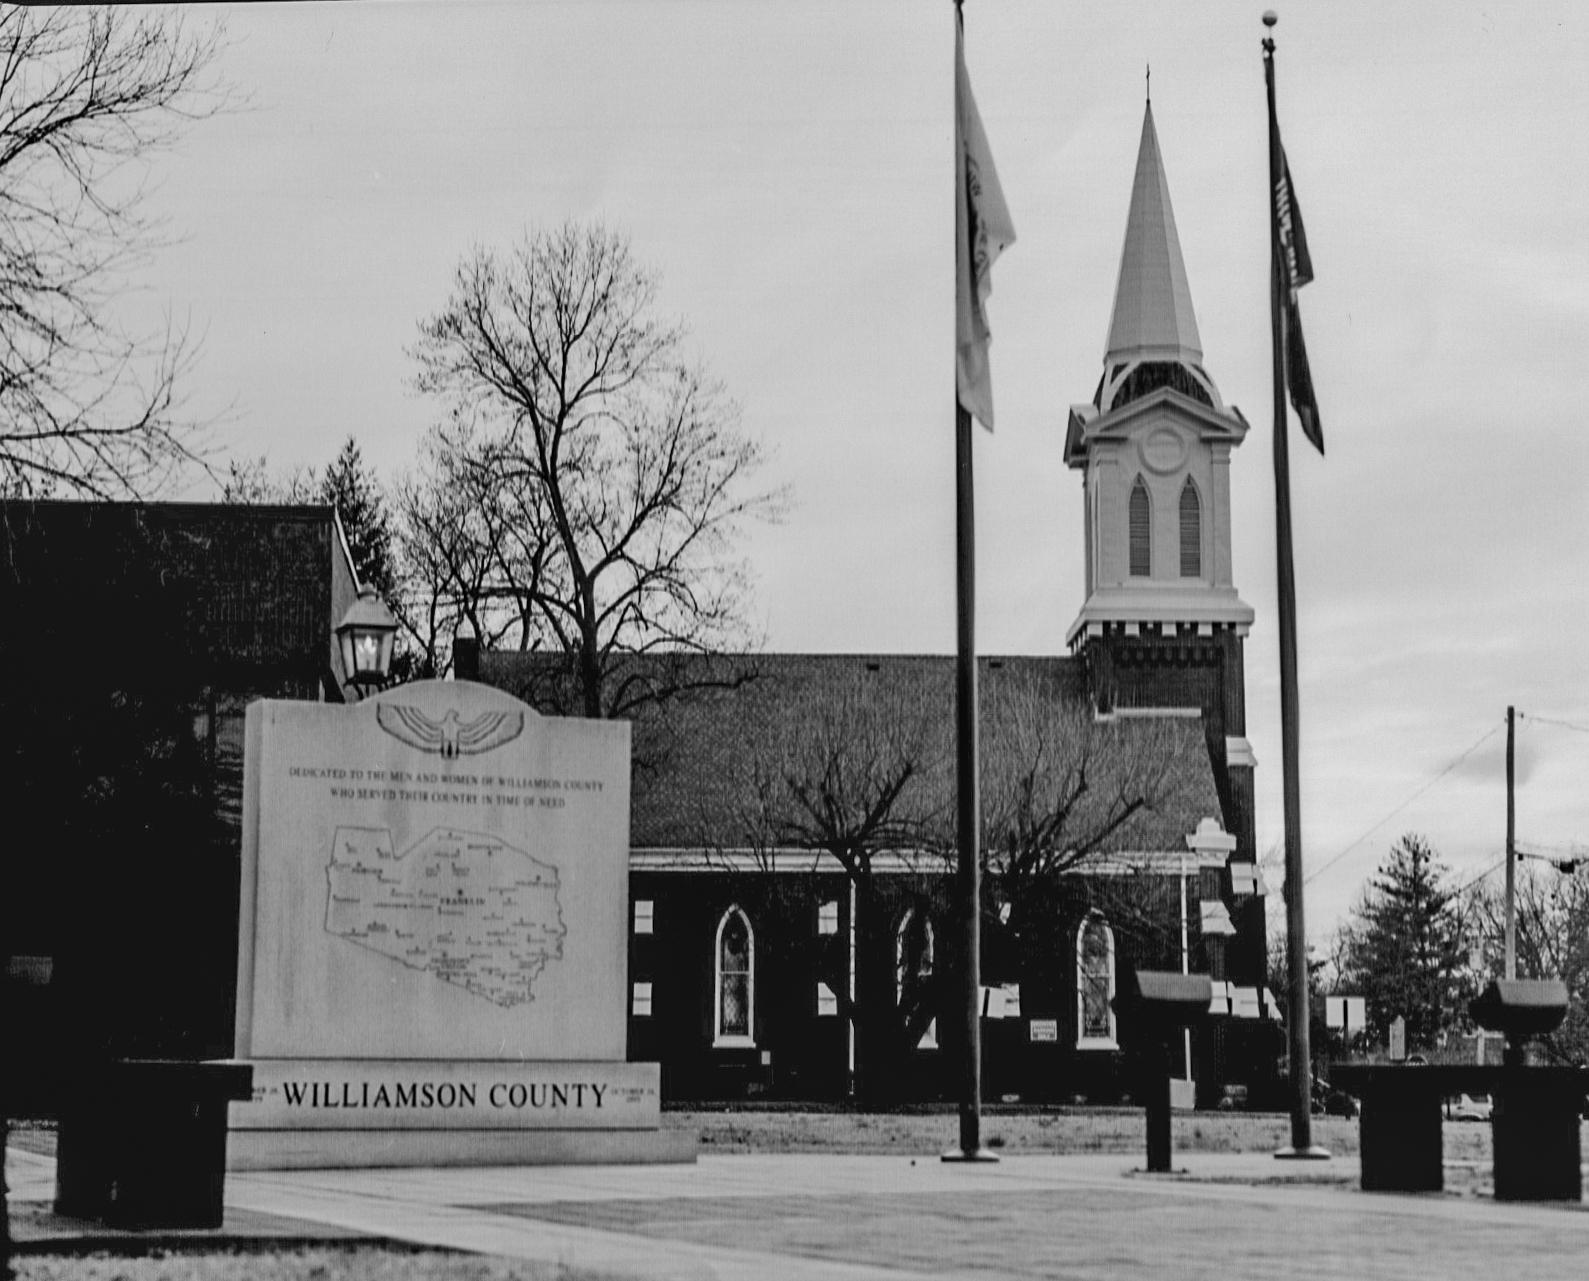 Cumberland Presbyterian Church - 2/4/2015